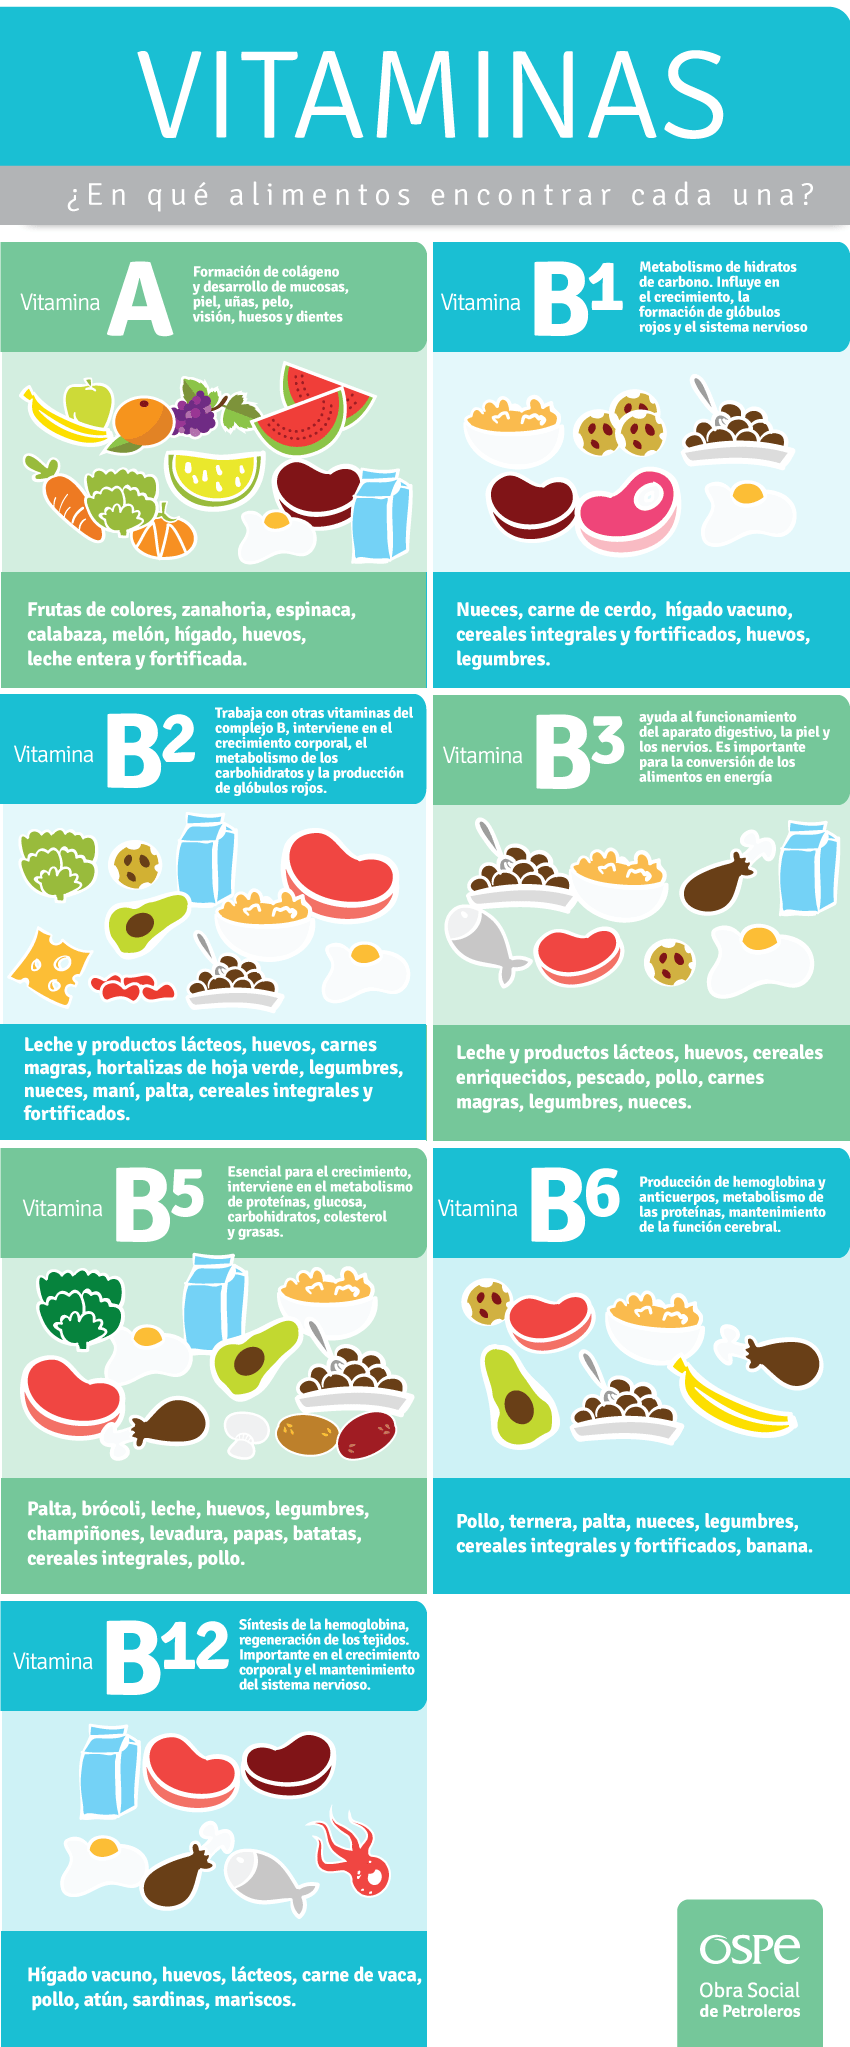 En qué alimentos encontrar cada vitamina? | Veggie | Pinterest ...